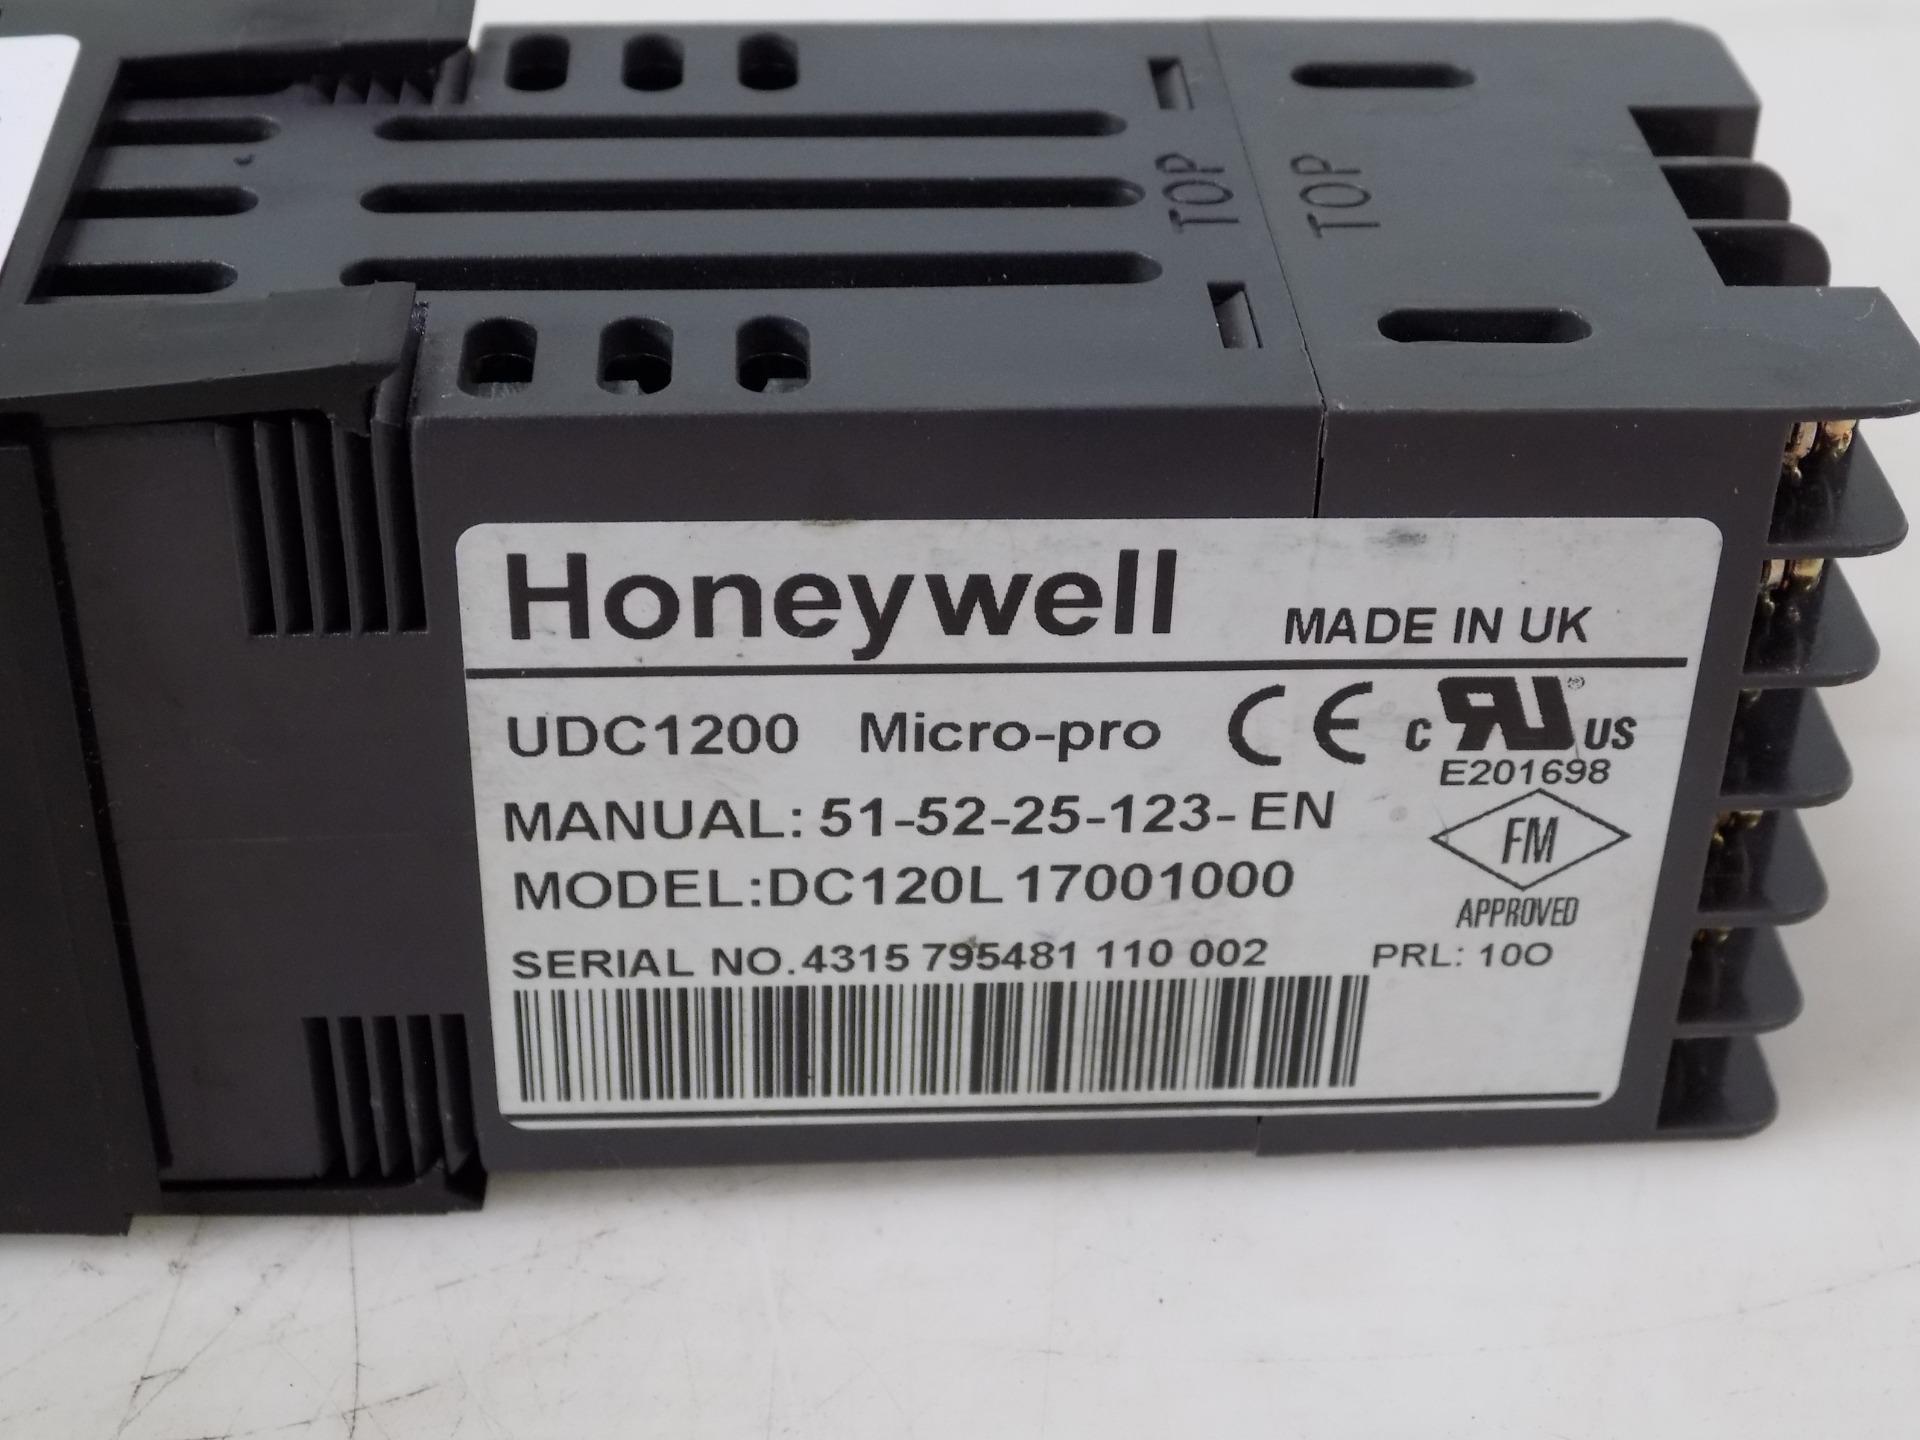 honeywell udc1200 micro pro temperature controller dc120l17001000 ebay rh ebay com Honeywell Thermostat Programming Manual Honeywell Pro 8000 Thermostat Manual